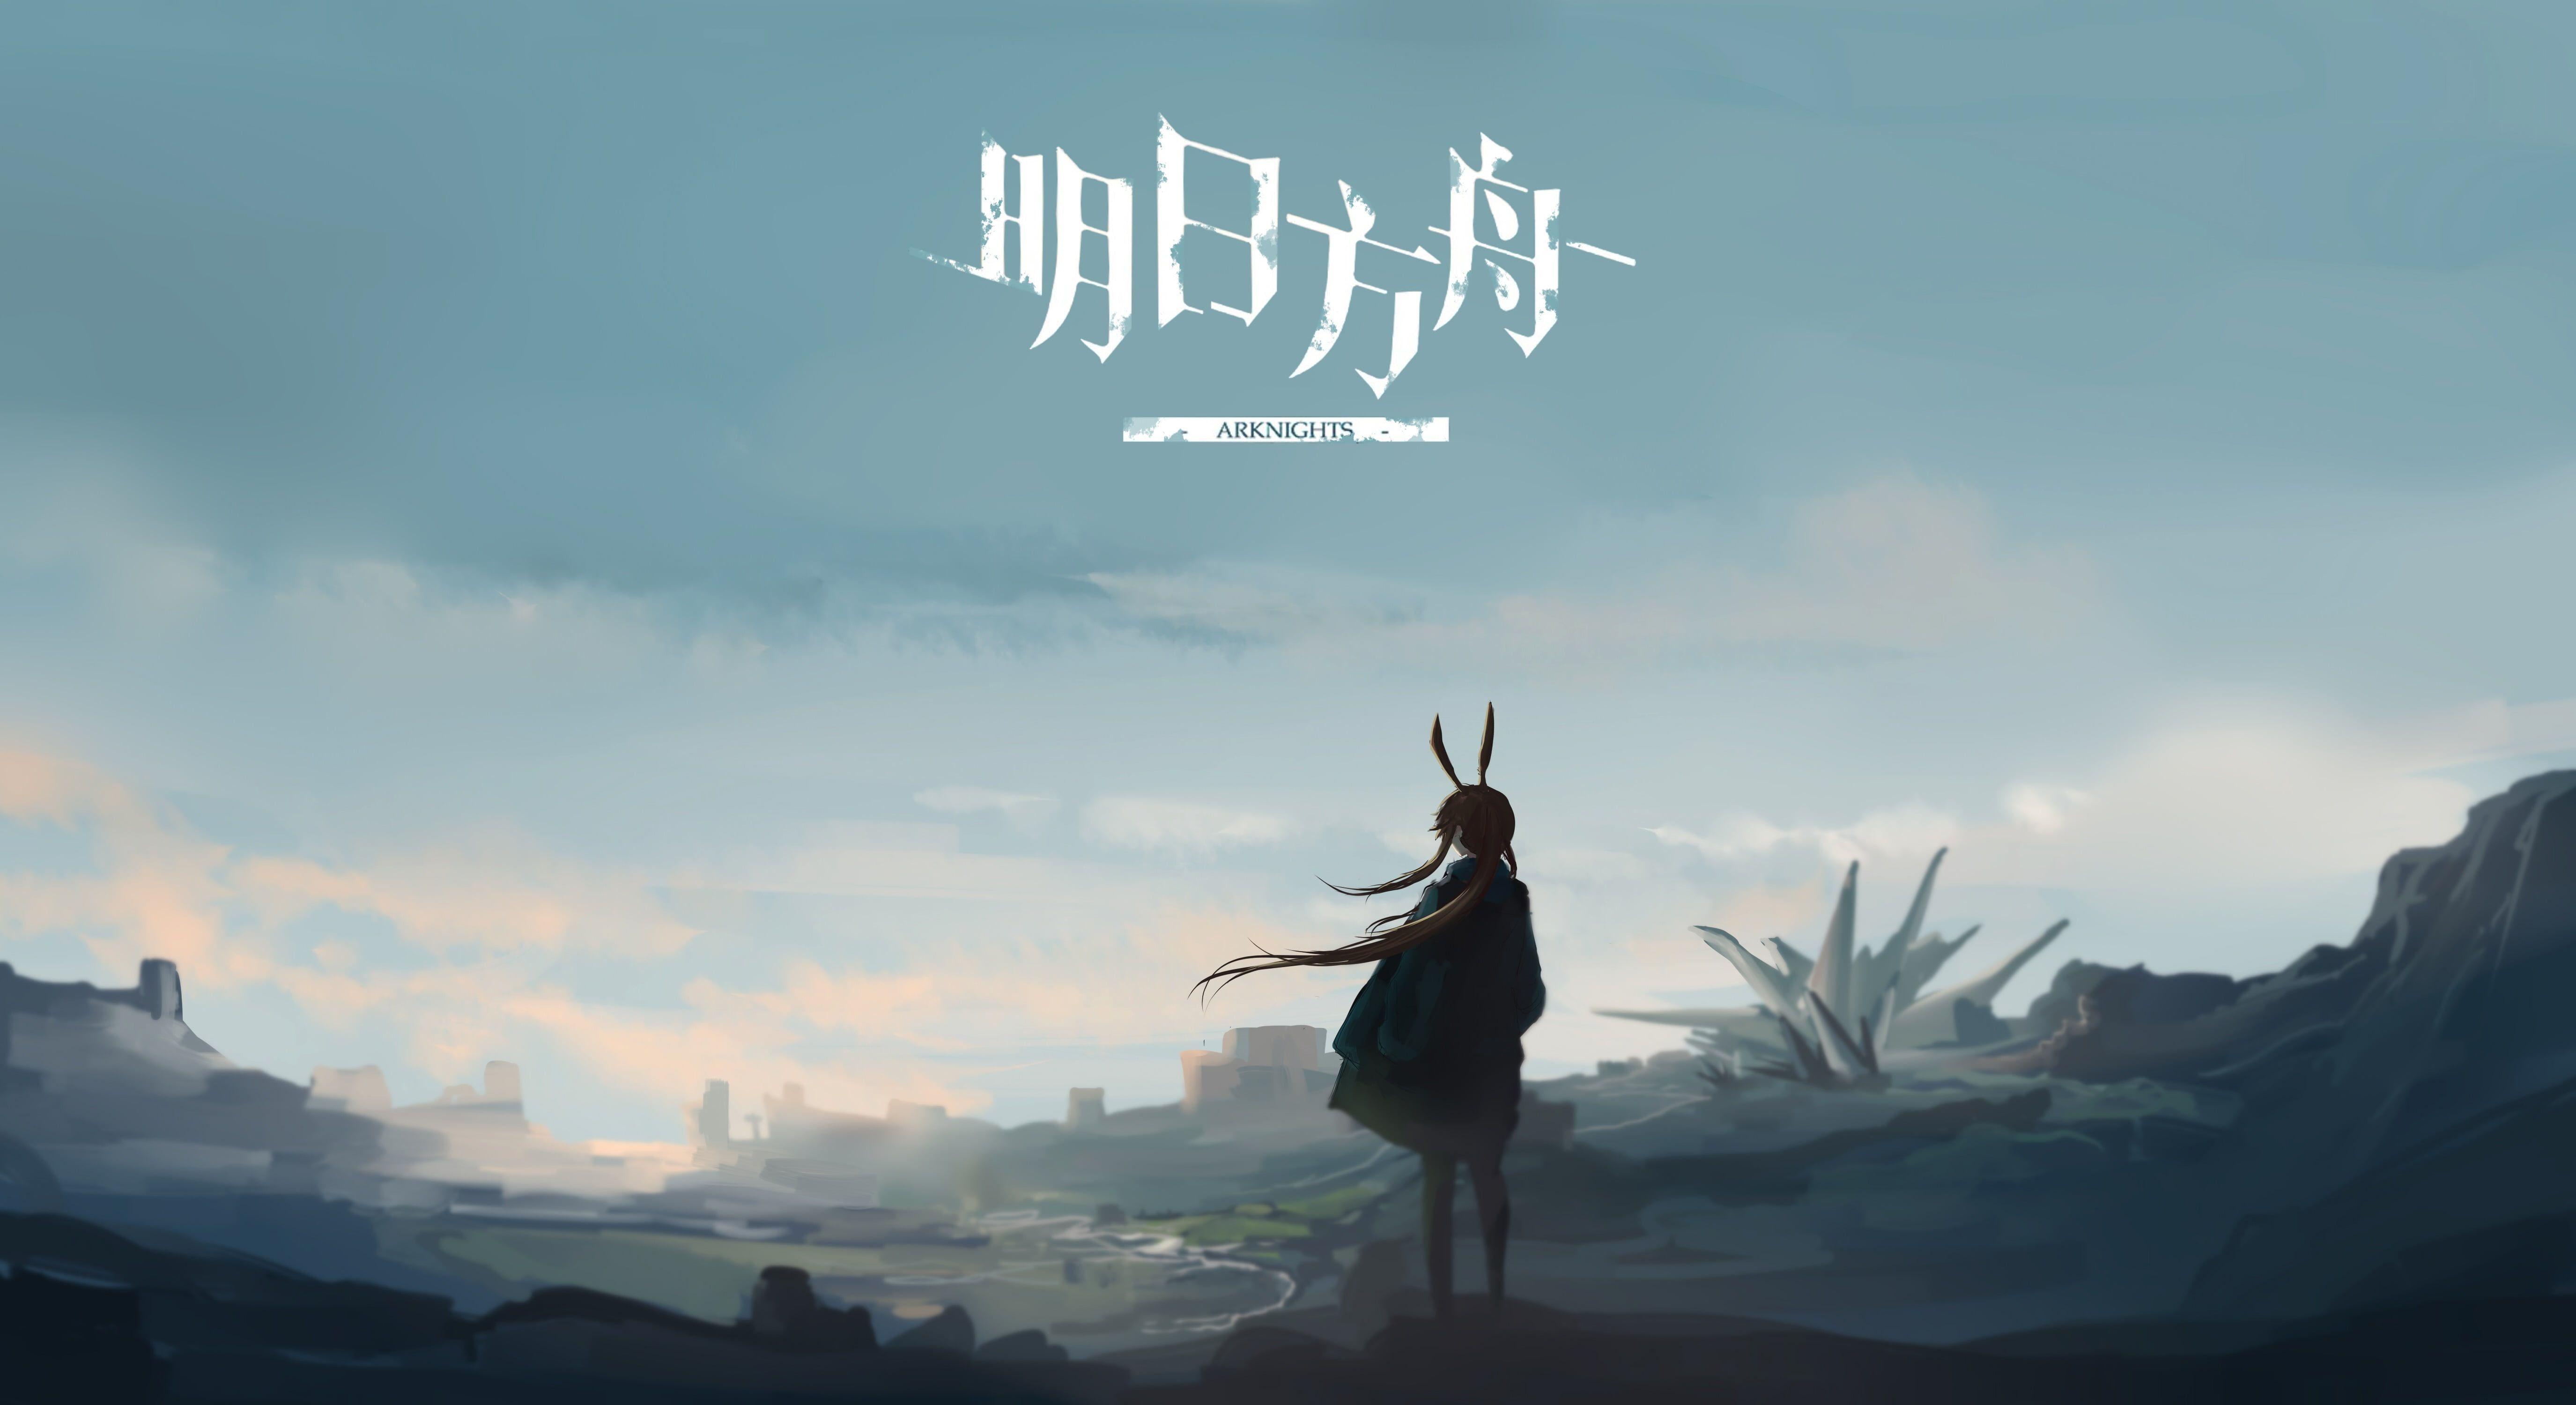 Video Game Arknights Amiya Arknights 5k Wallpaper Hdwallpaper Desktop Anime Background Wallpaper Backgrounds Hd Wallpaper